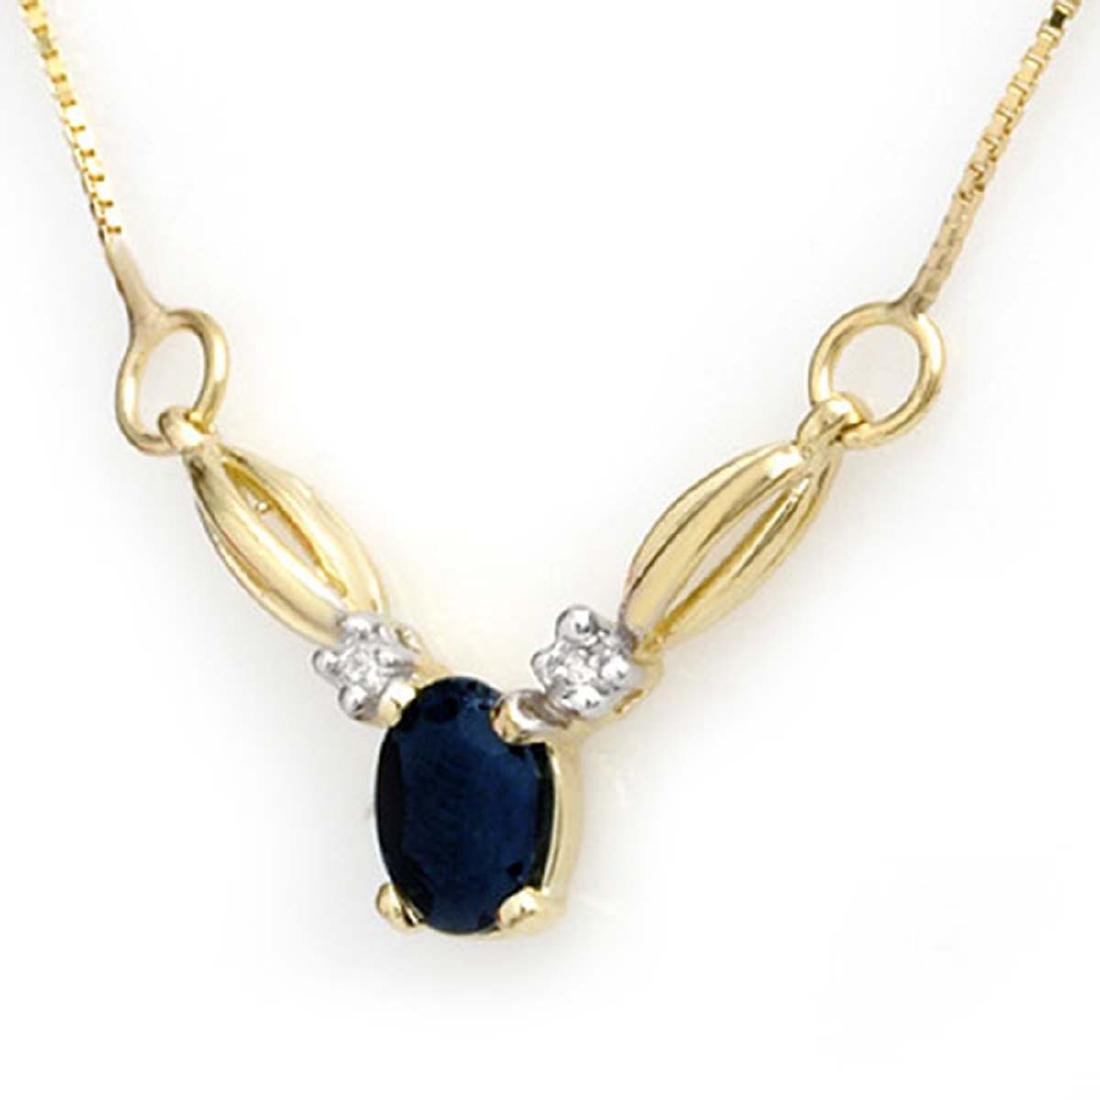 1.30 CTW Genuine Blue Sapphire & Diamond Necklace 10K